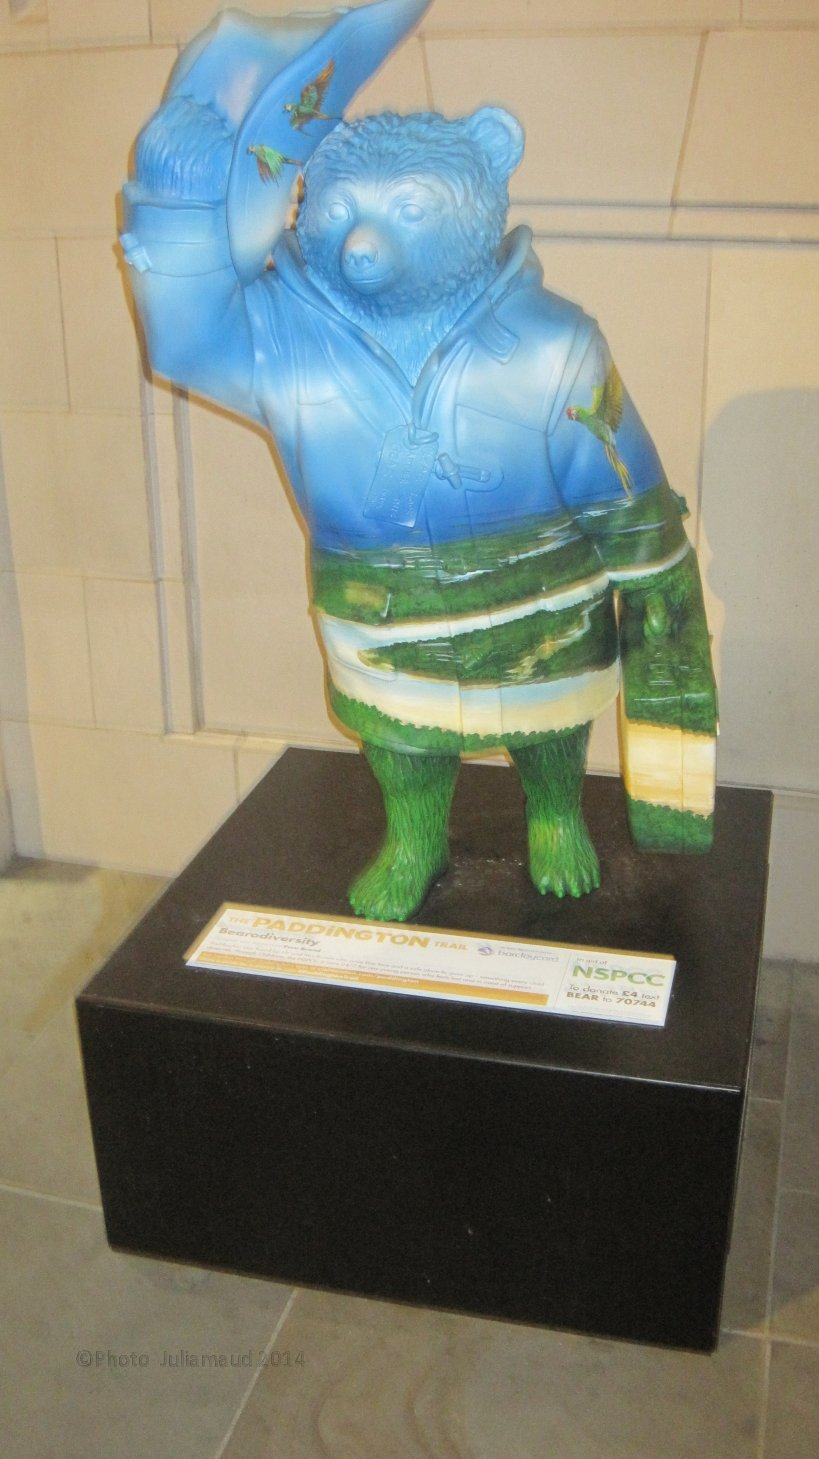 Paddington Bear in London by Juliamaud